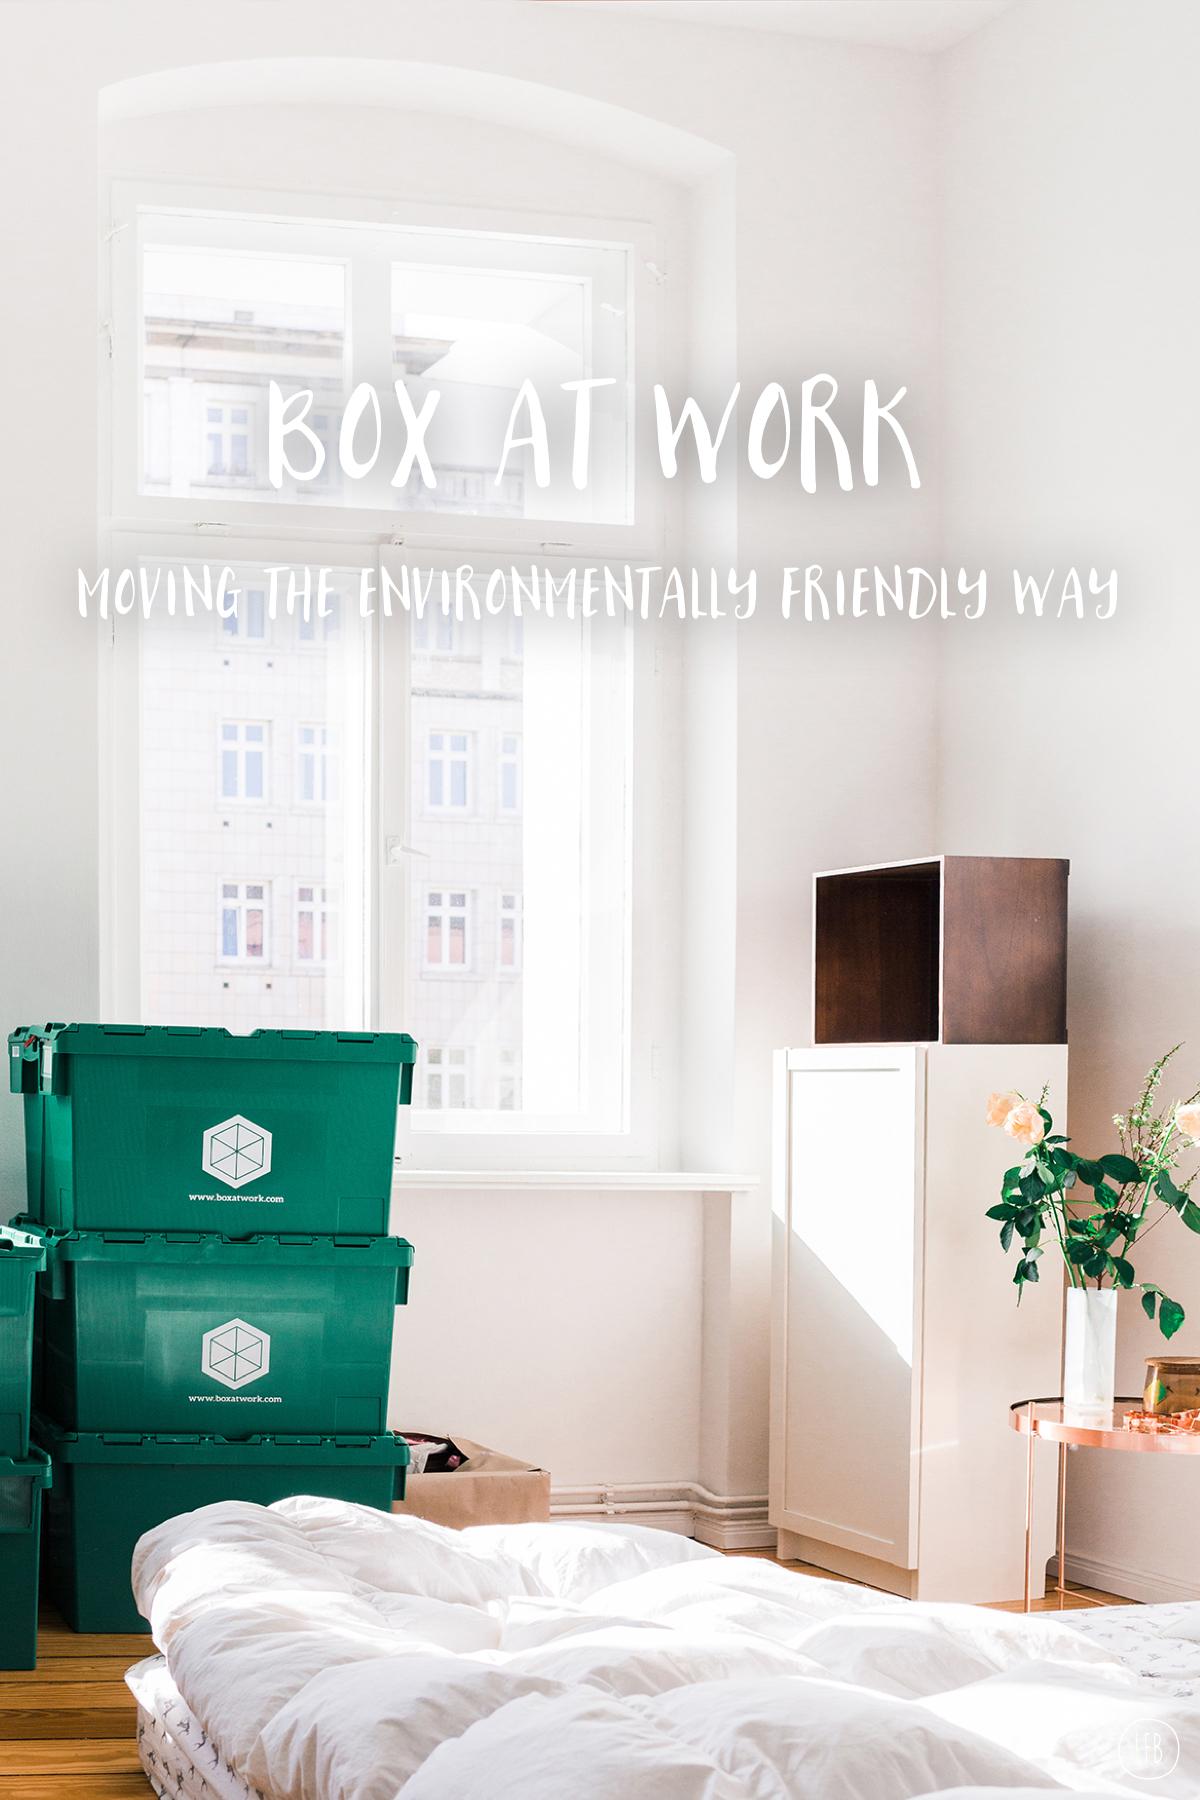 Box at Work - environmentally friendly moving service - boxatwork.com - photography: Sandro Moscogiuri - for loveformberlin.net